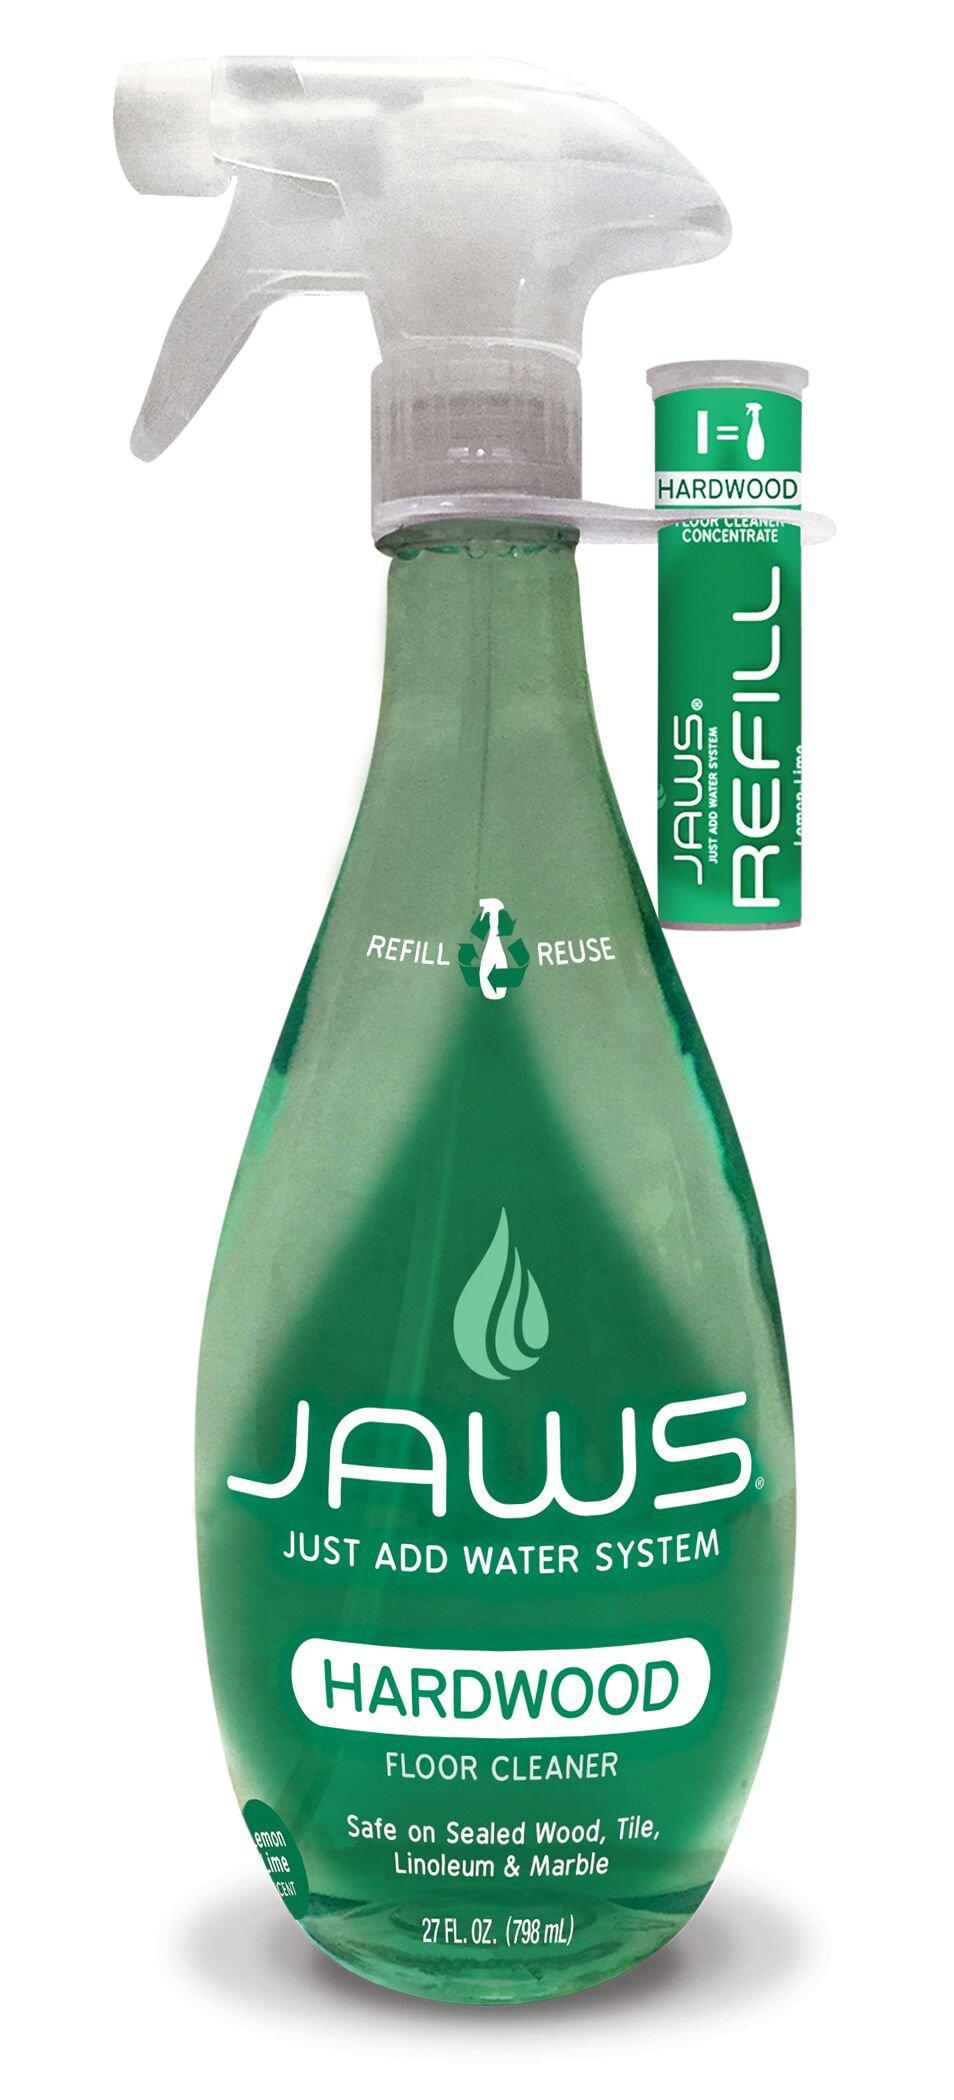 JAWS Hardwood Floor Cleaner Kit